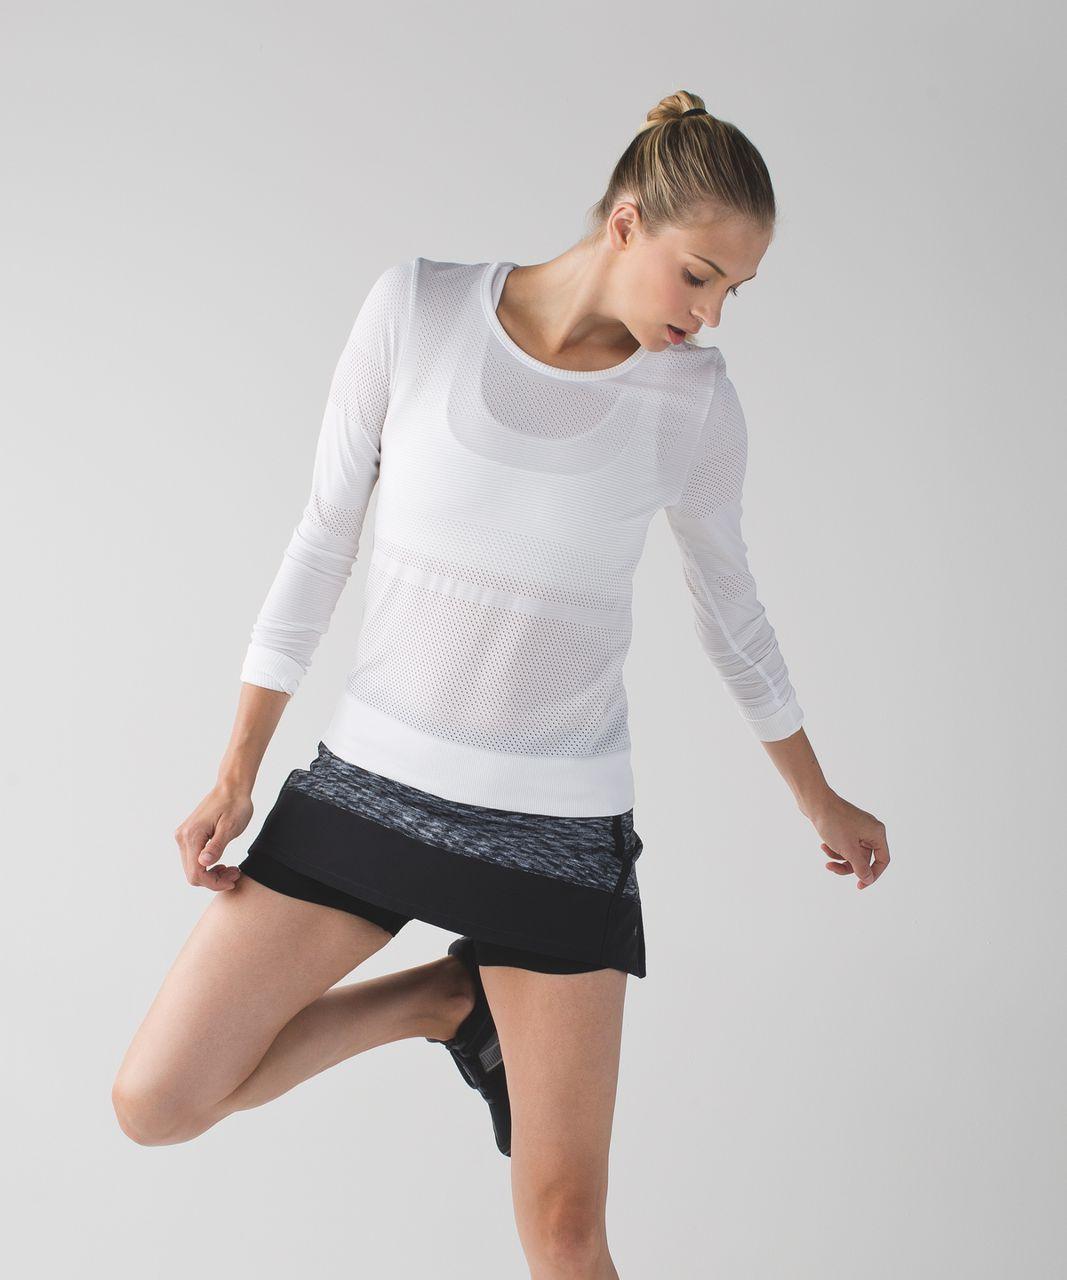 Lululemon Pace Rival Skirt II (Regular) *4-way Stretch - Dramatic Static White Black / Black